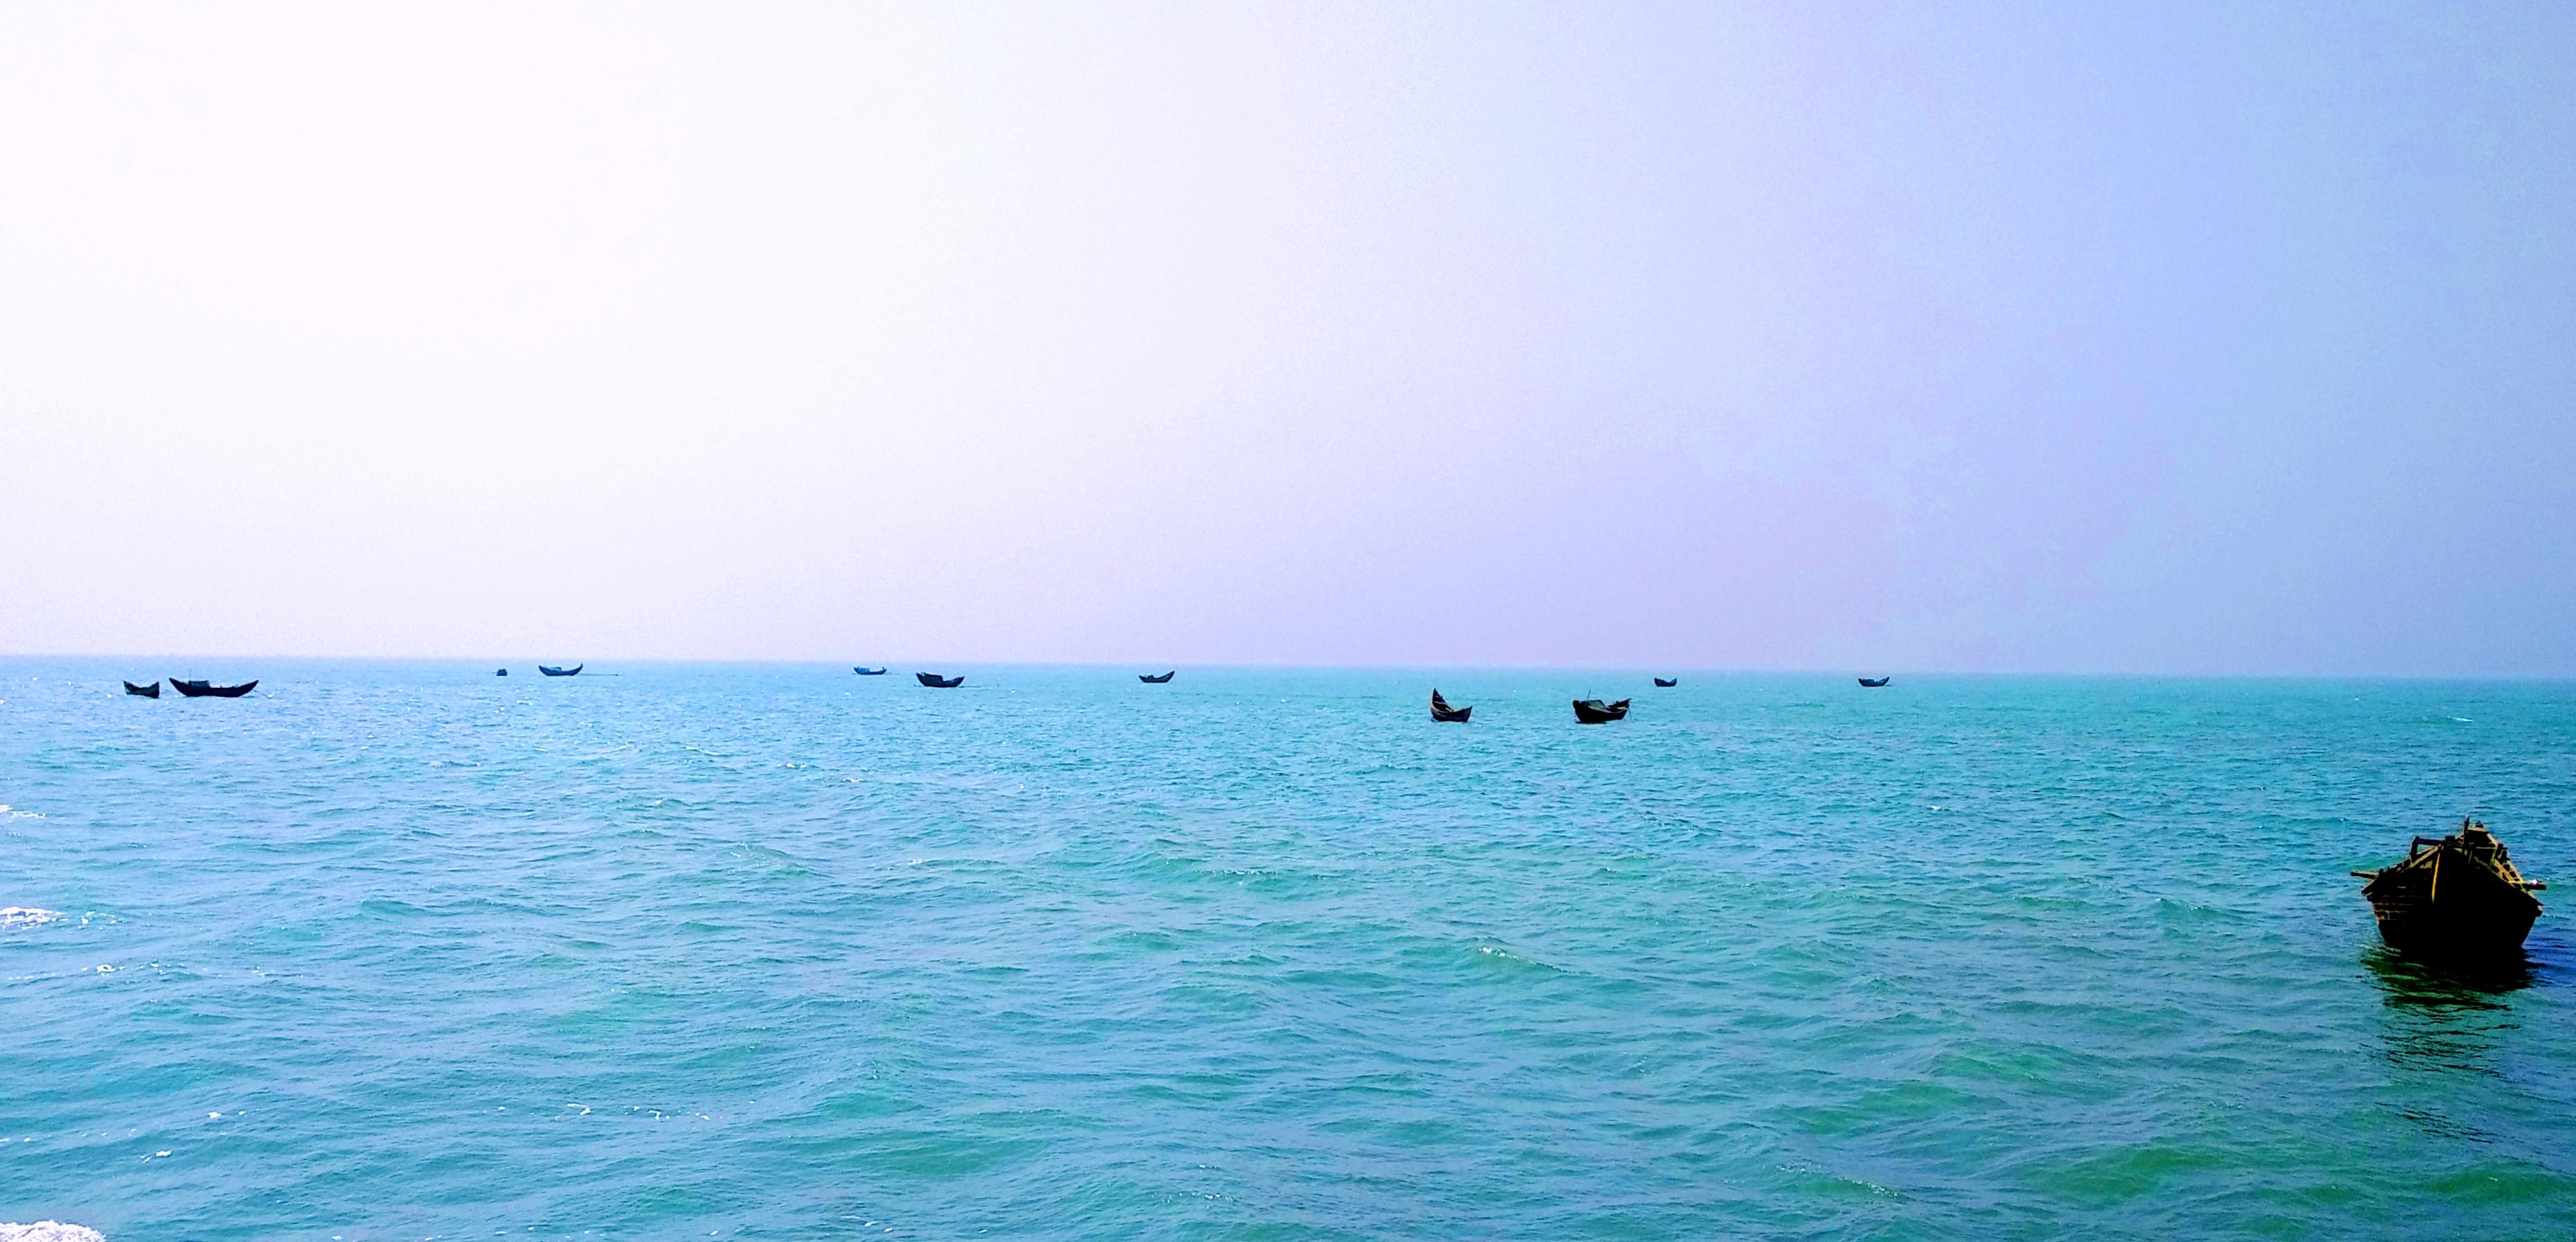 Floating Fishing Boat in Naf River, Afternoon, Sea, Naf, Ocean, HQ Photo